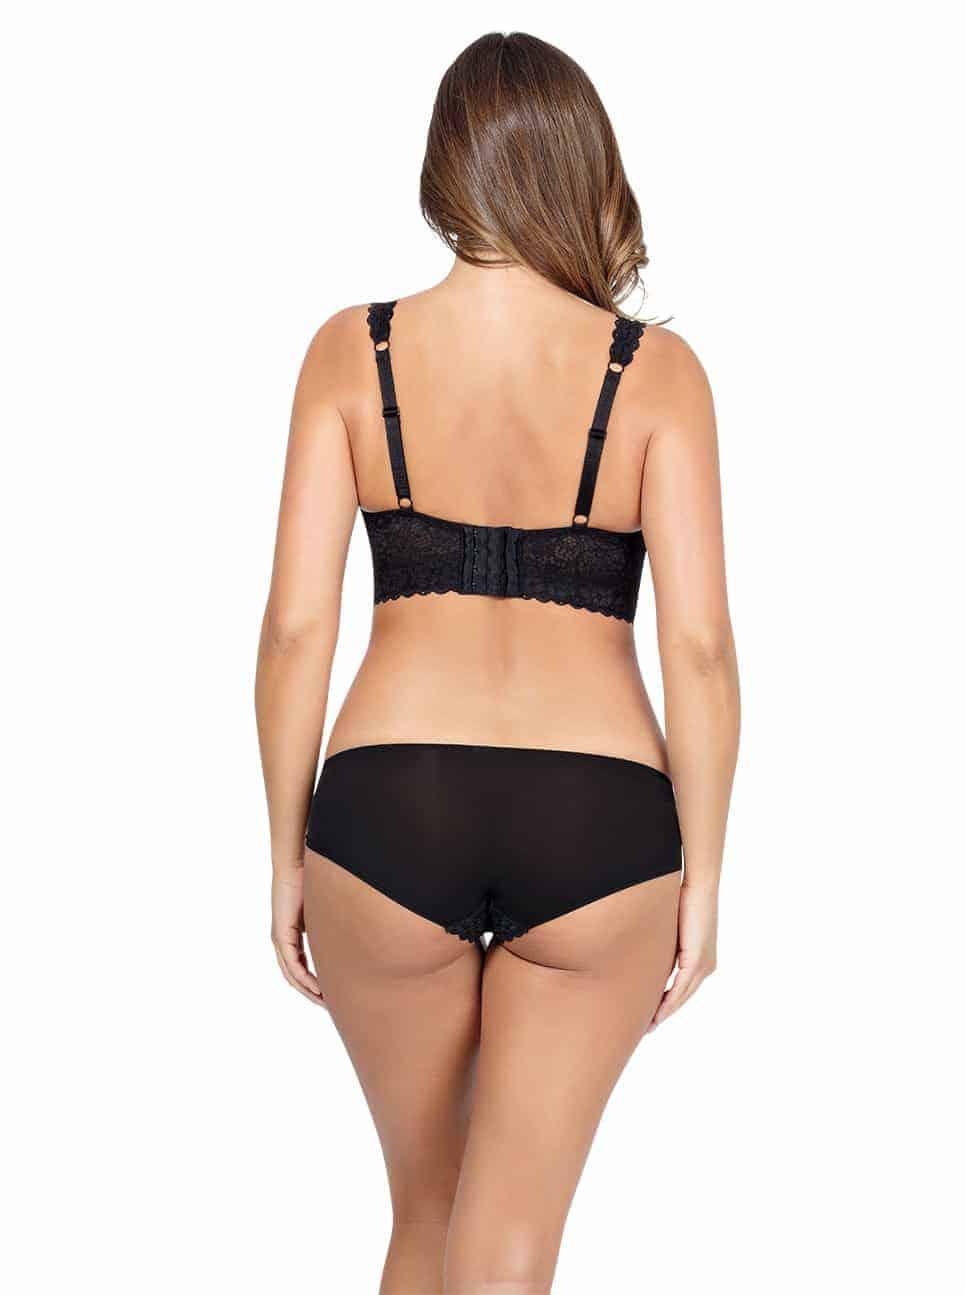 d7eb62051e PARFAIT Adriana LaceBraletteP5482 BikiniP5483 Black Full F.  PARFAIT Adriana LaceBraletteP5482 BikiniP5483 Black Full B. Parfait Adriana  ...